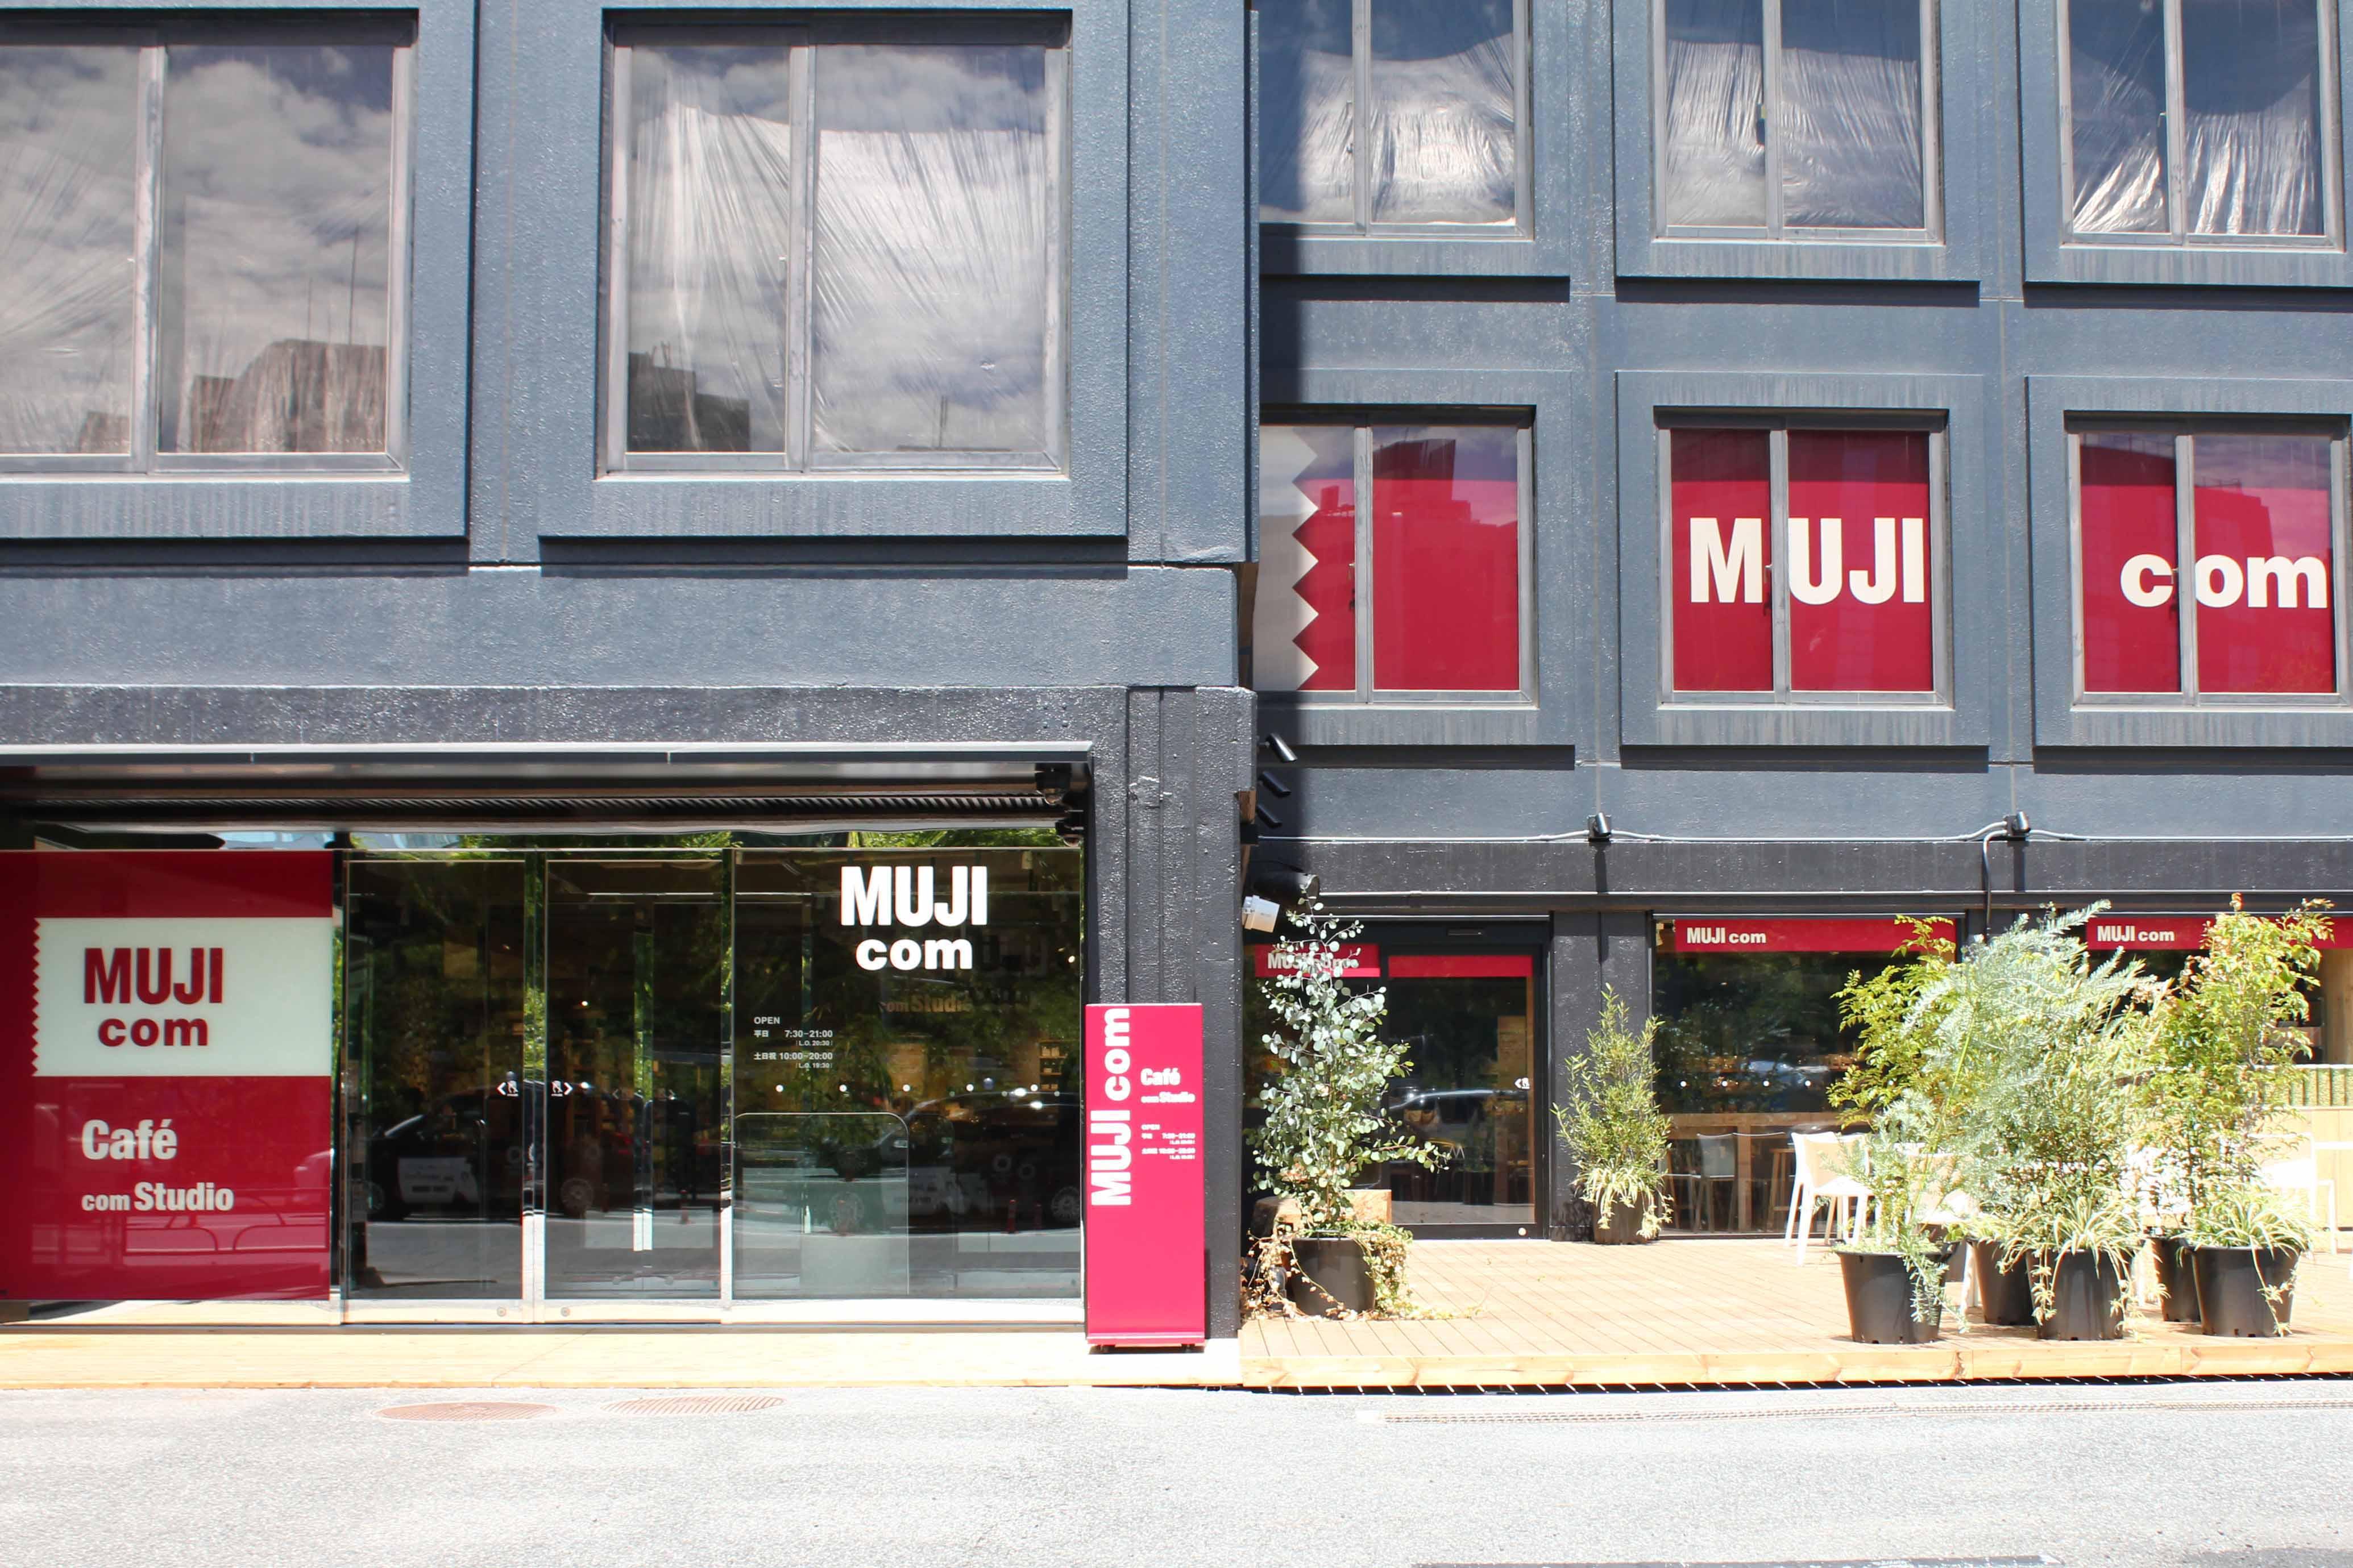 MUJI com 武蔵野美術大学市ヶ谷キャンパス 看板